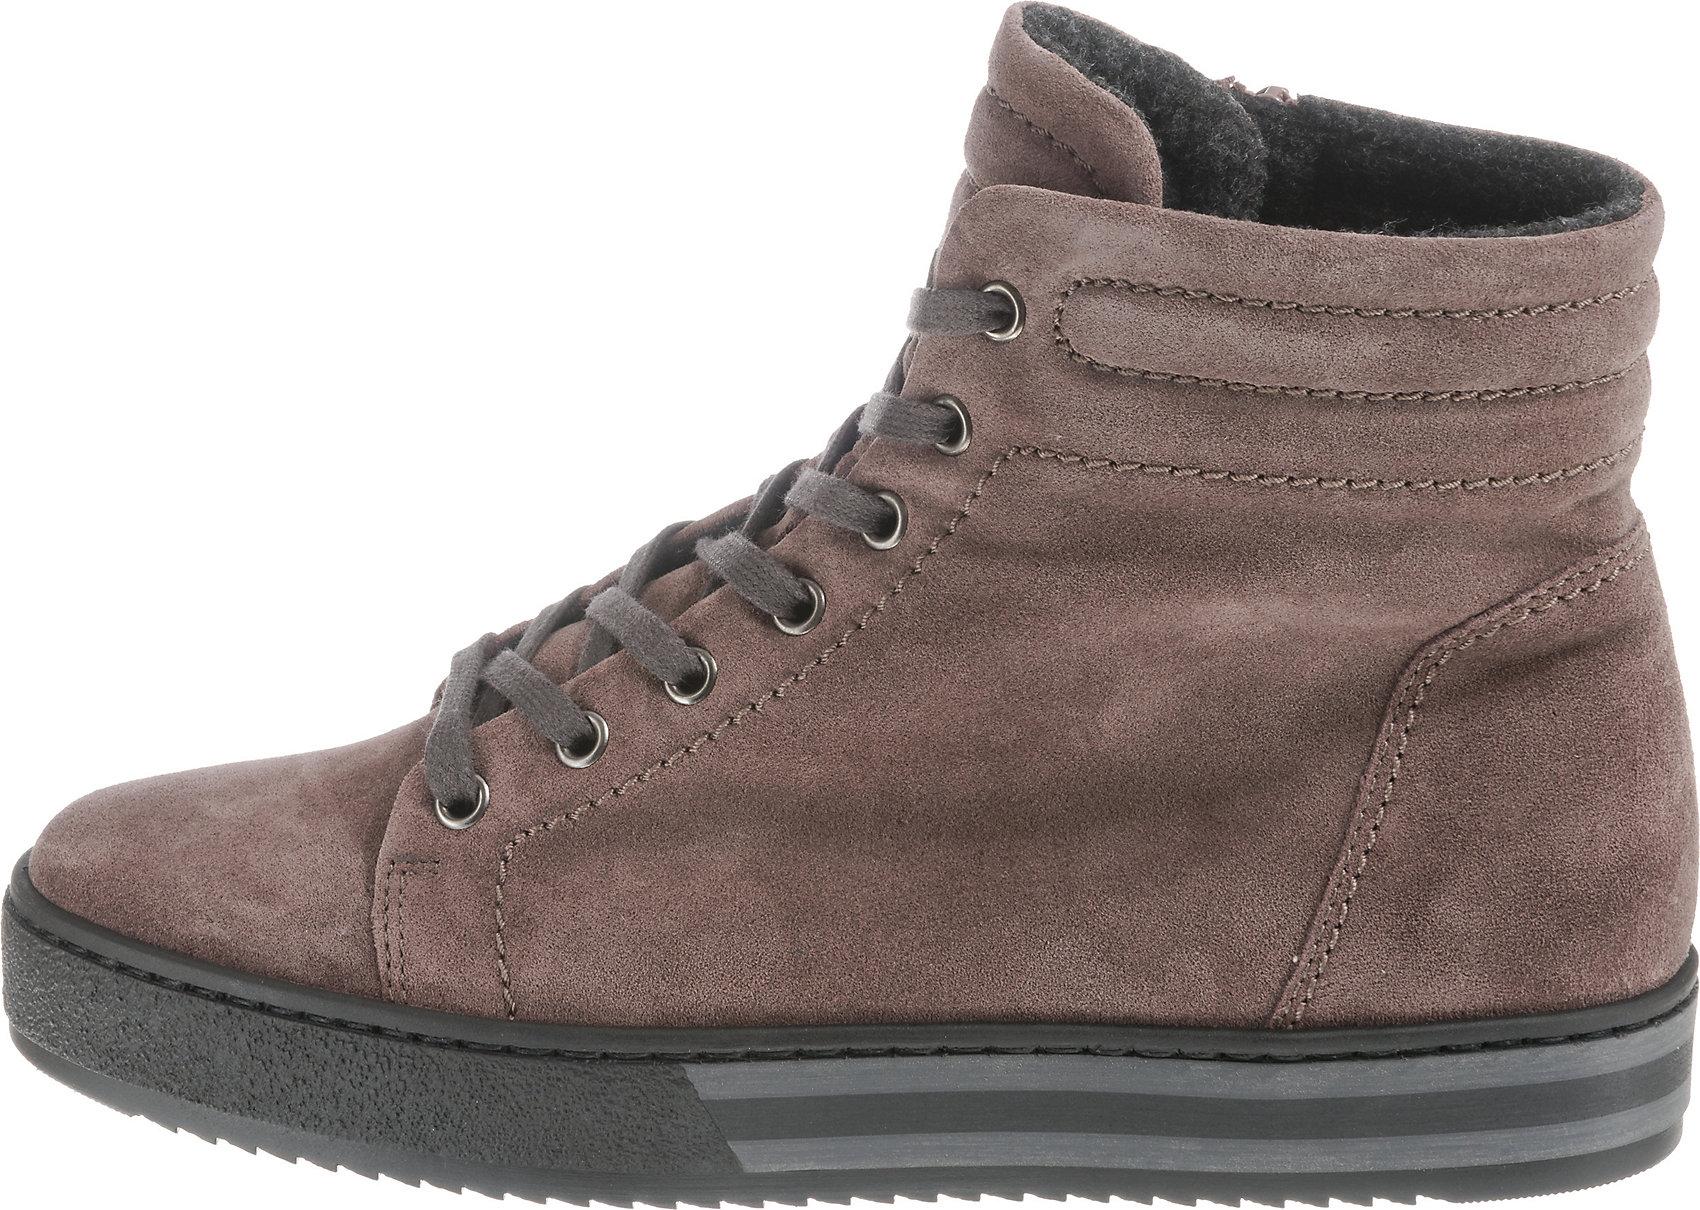 Sneakers Gabor Damen 8828134 Neu Braun Für High 6SdxF5wa